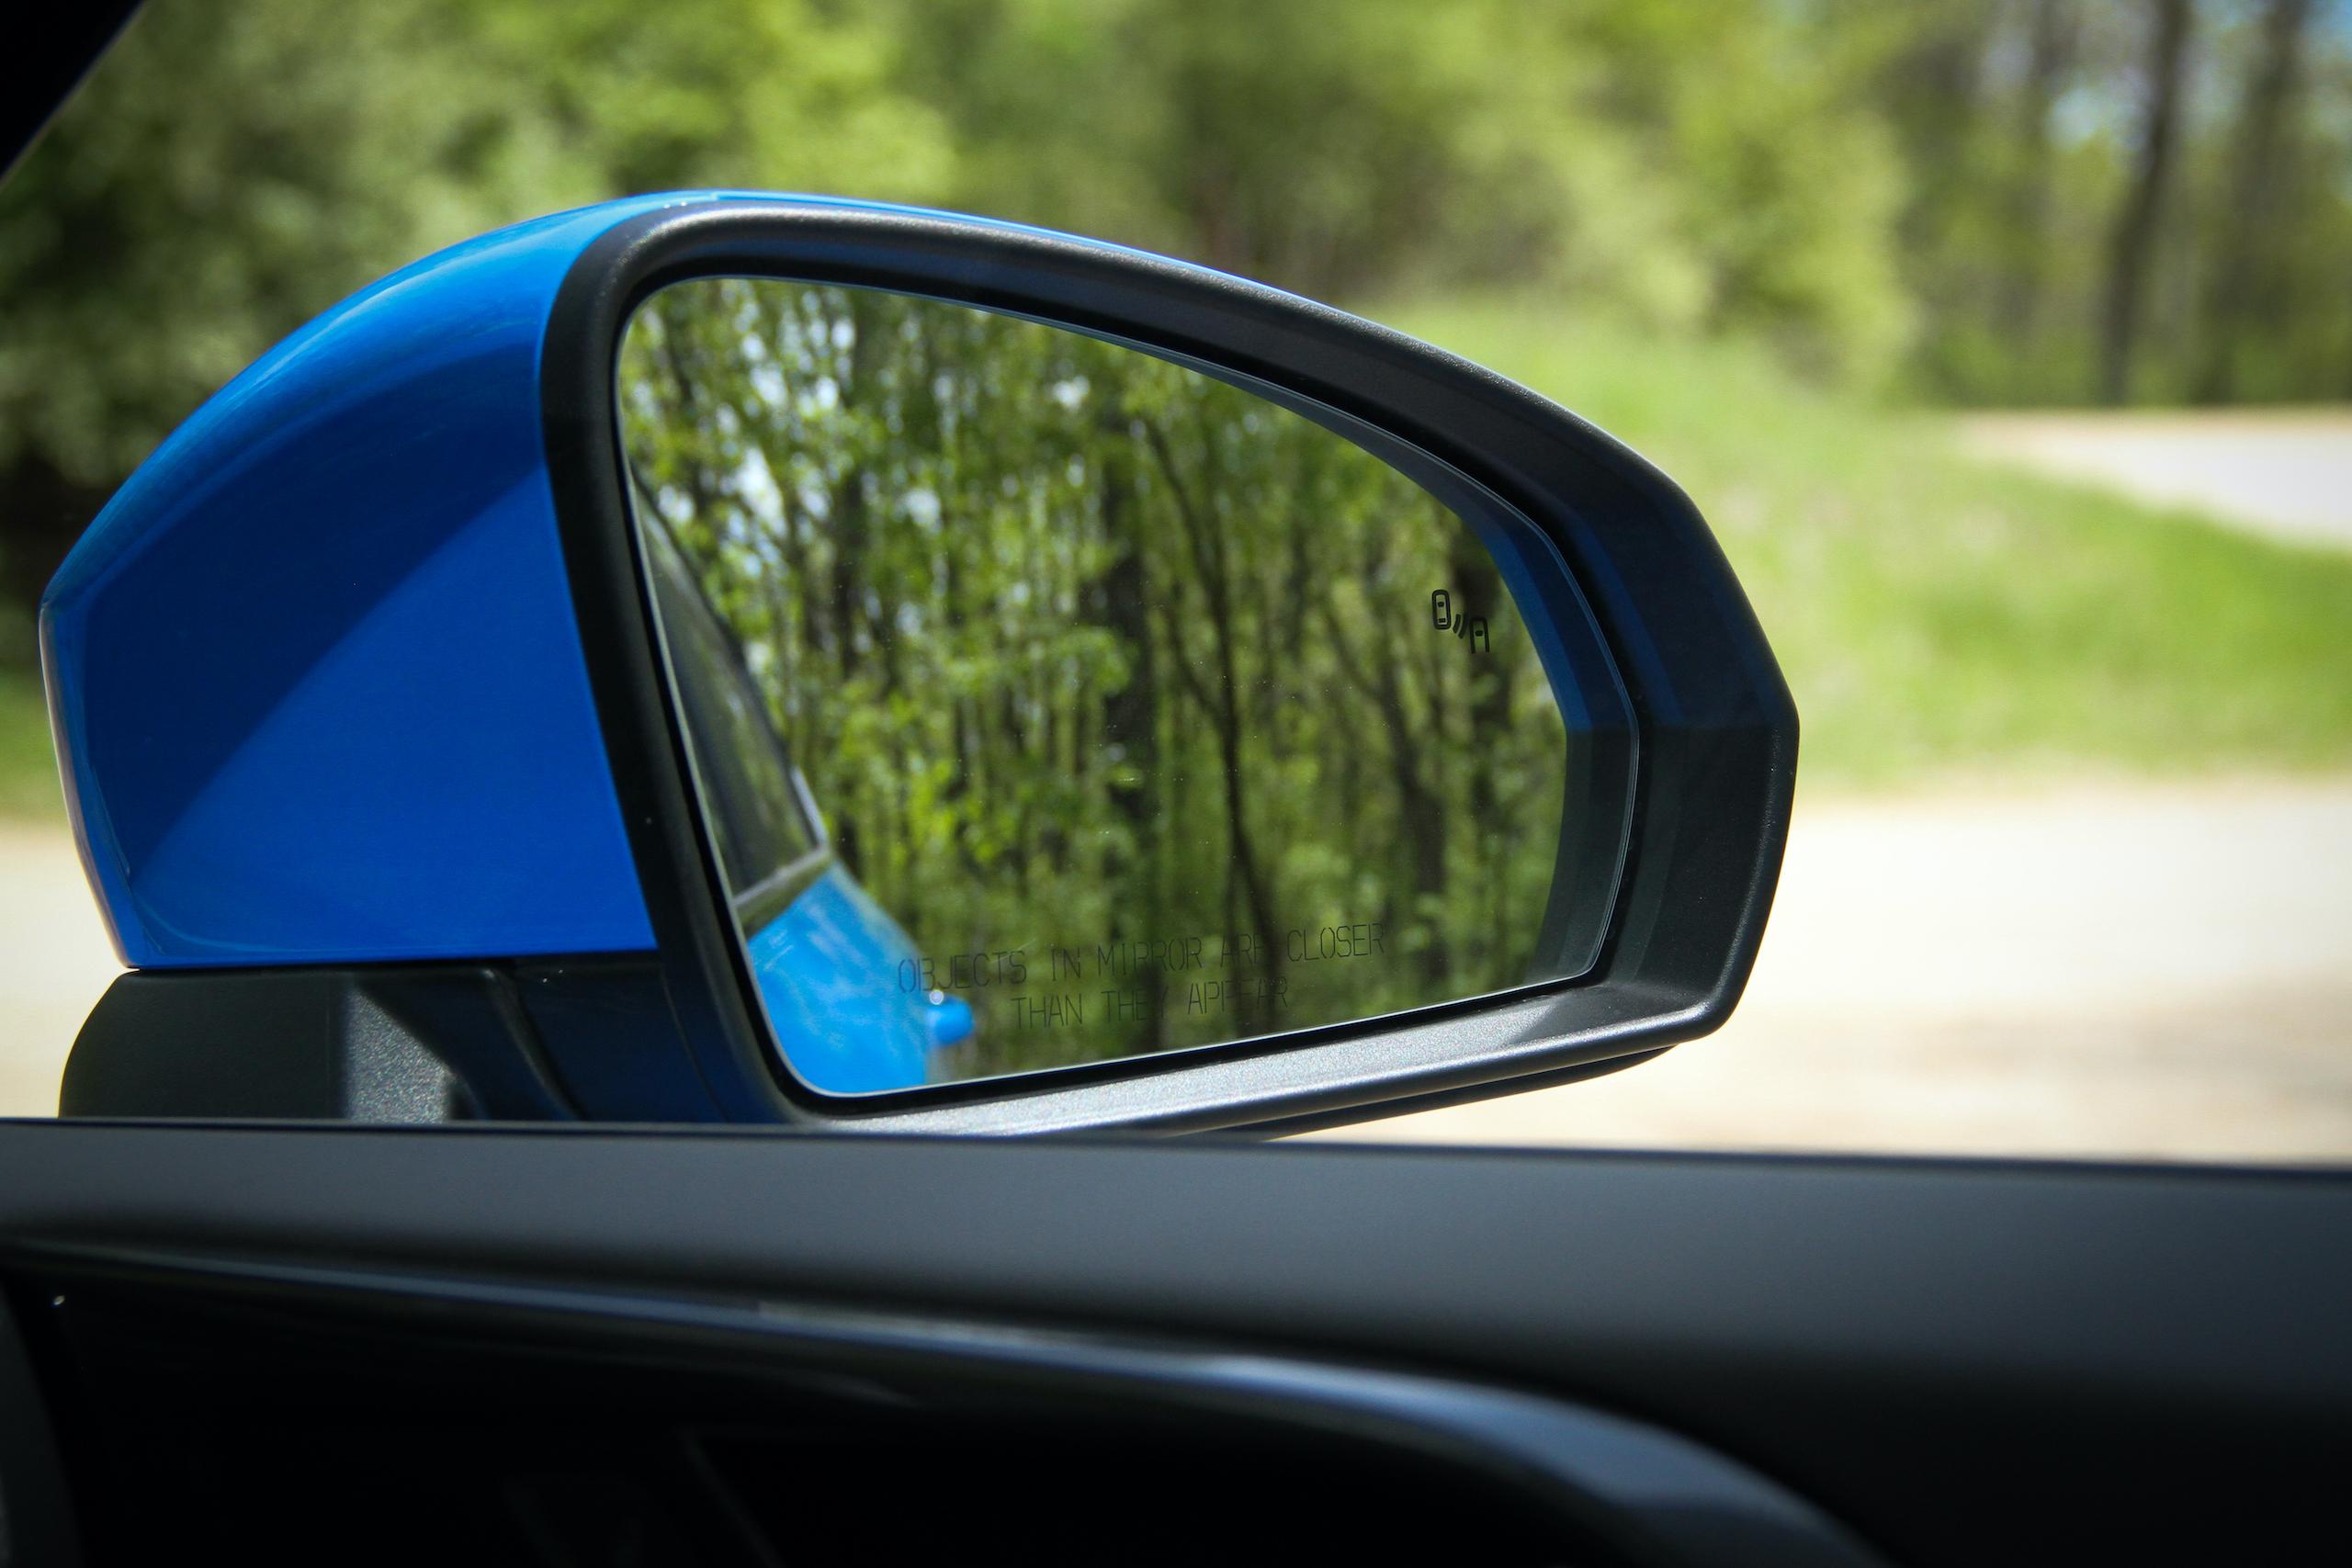 2022 Volkswagen Taos SEL mirror